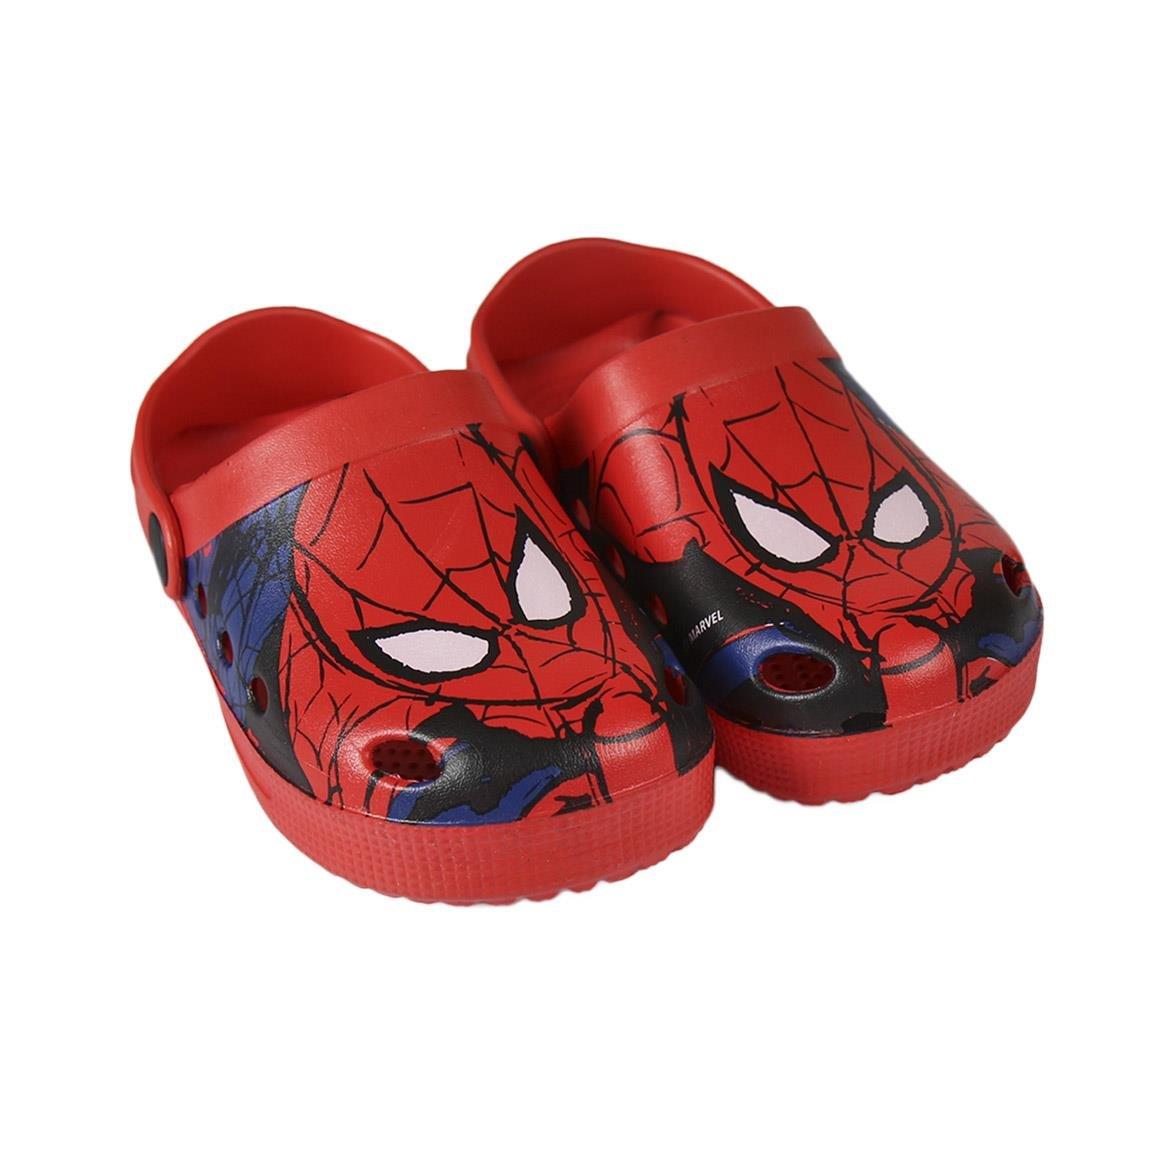 Zuecos de Playa Spiderman 5208 (talla 29) S0704803